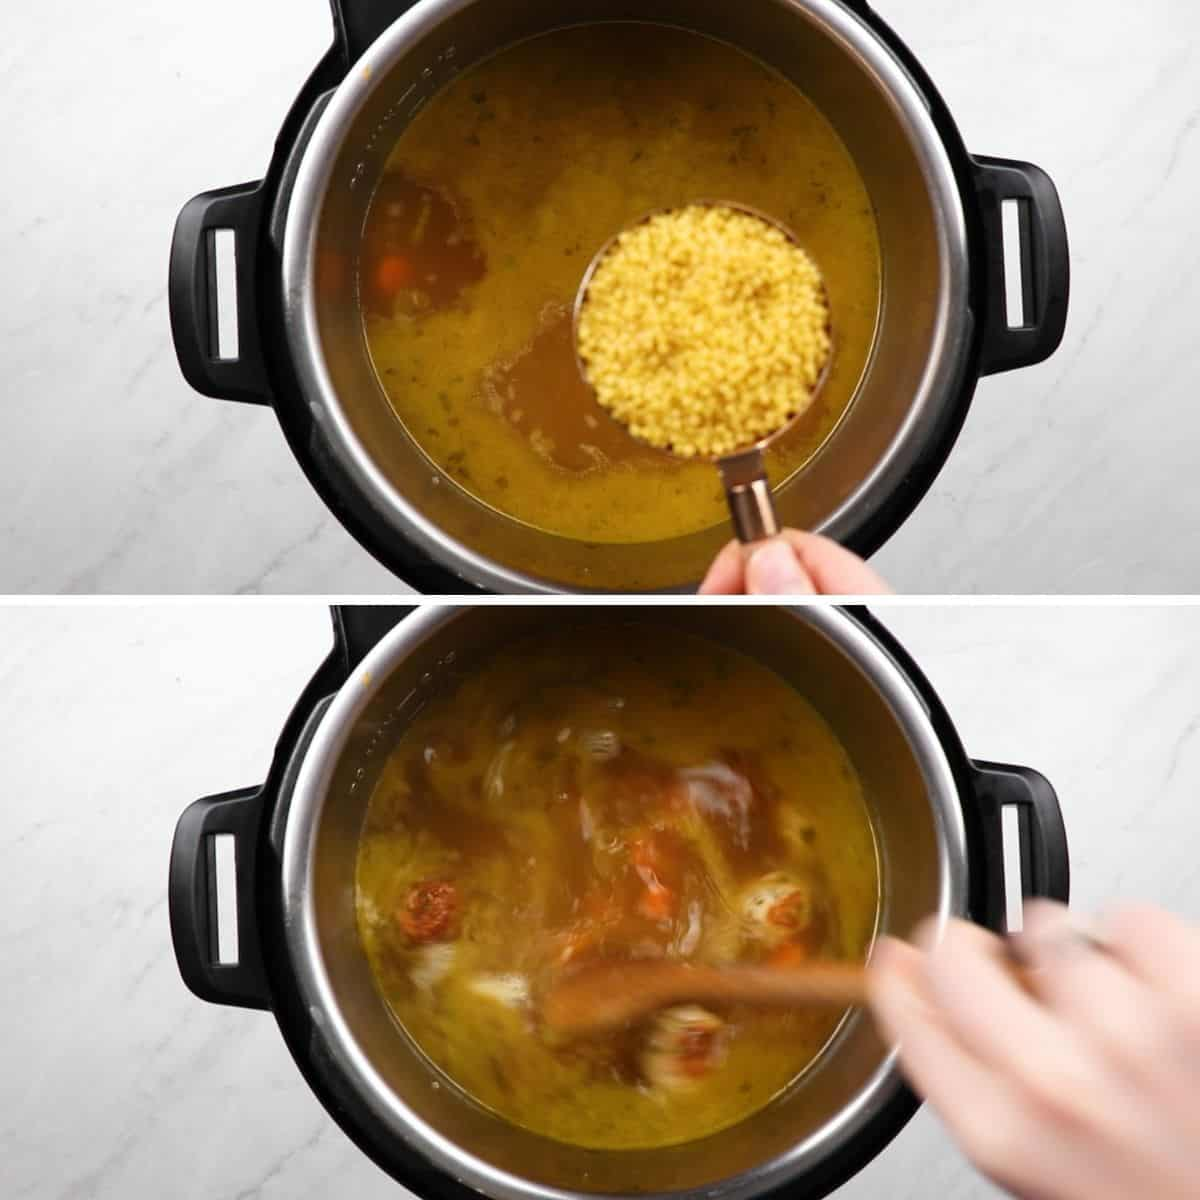 Process photos of adding accini de pepe to a pressure cooker.